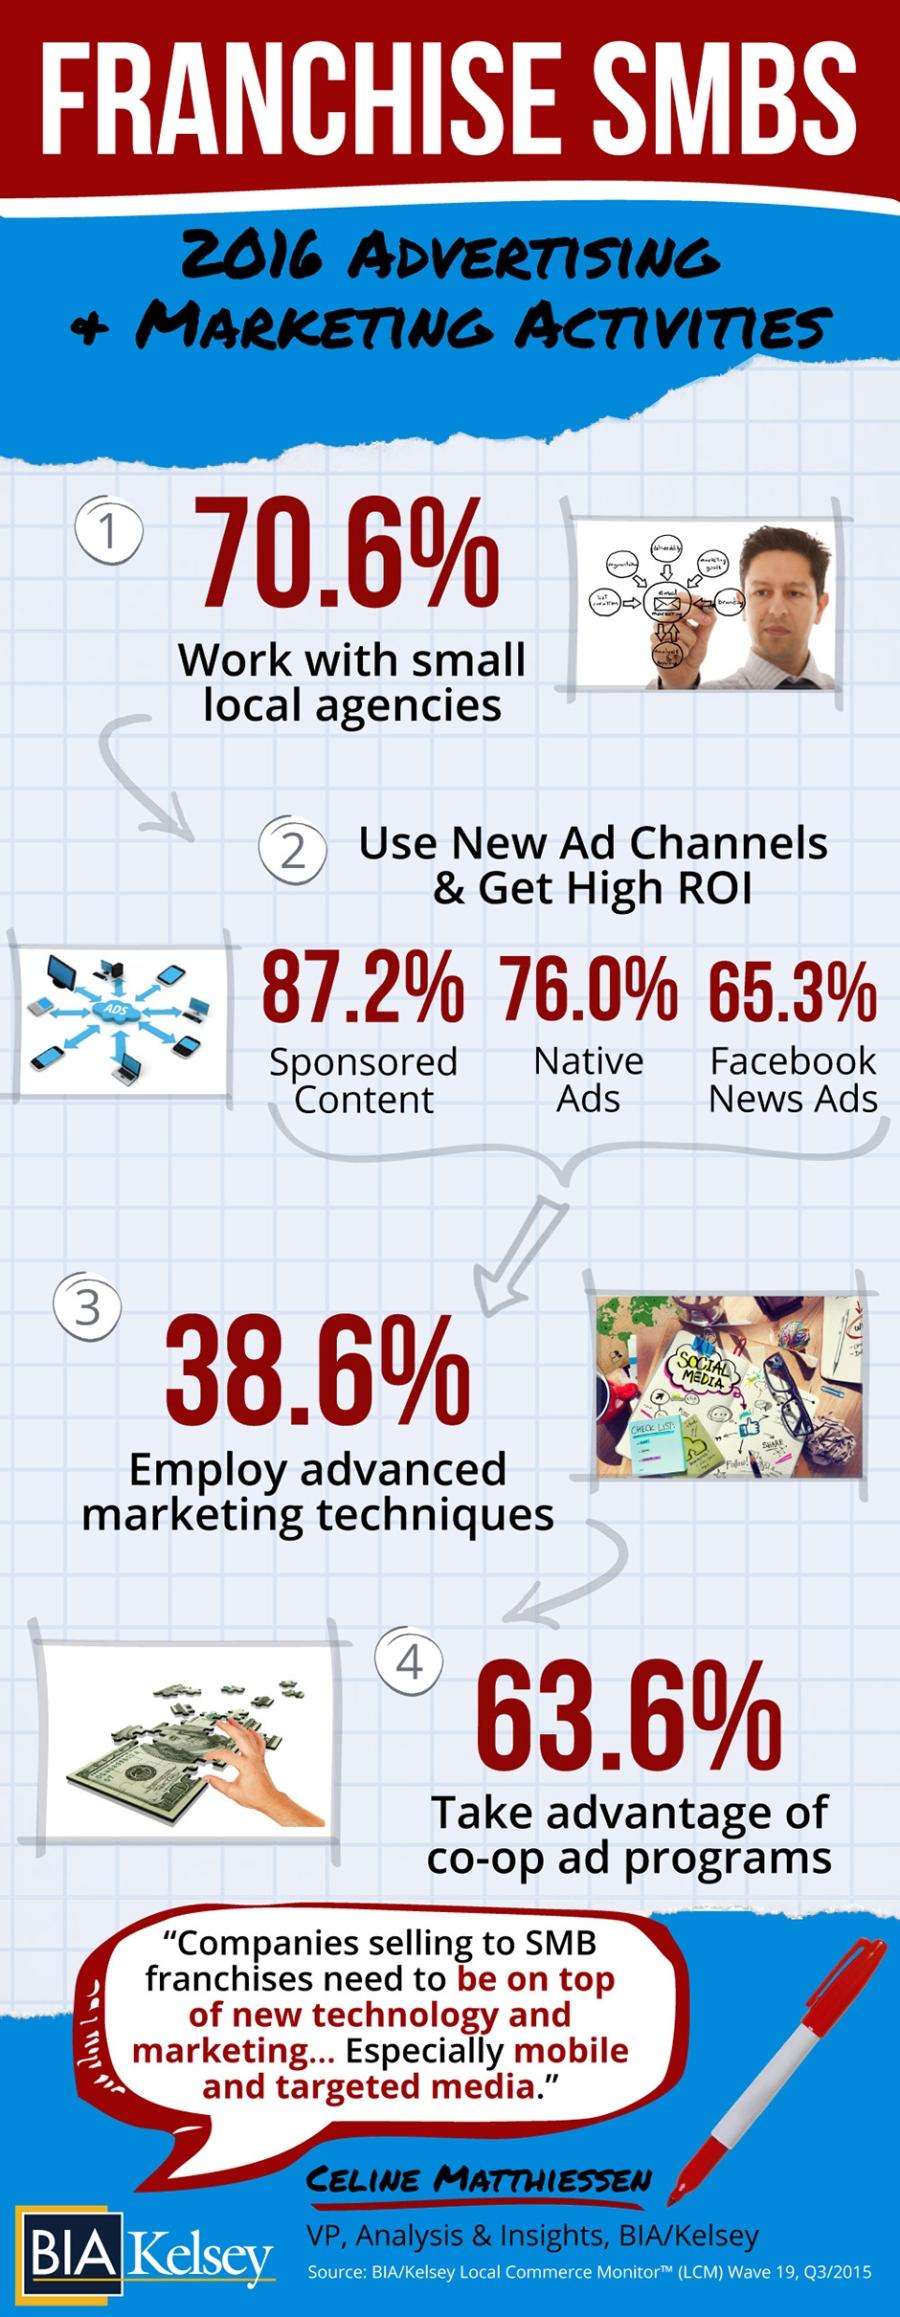 Franchises-SMB-Digital-Marketing-Trends.jpg